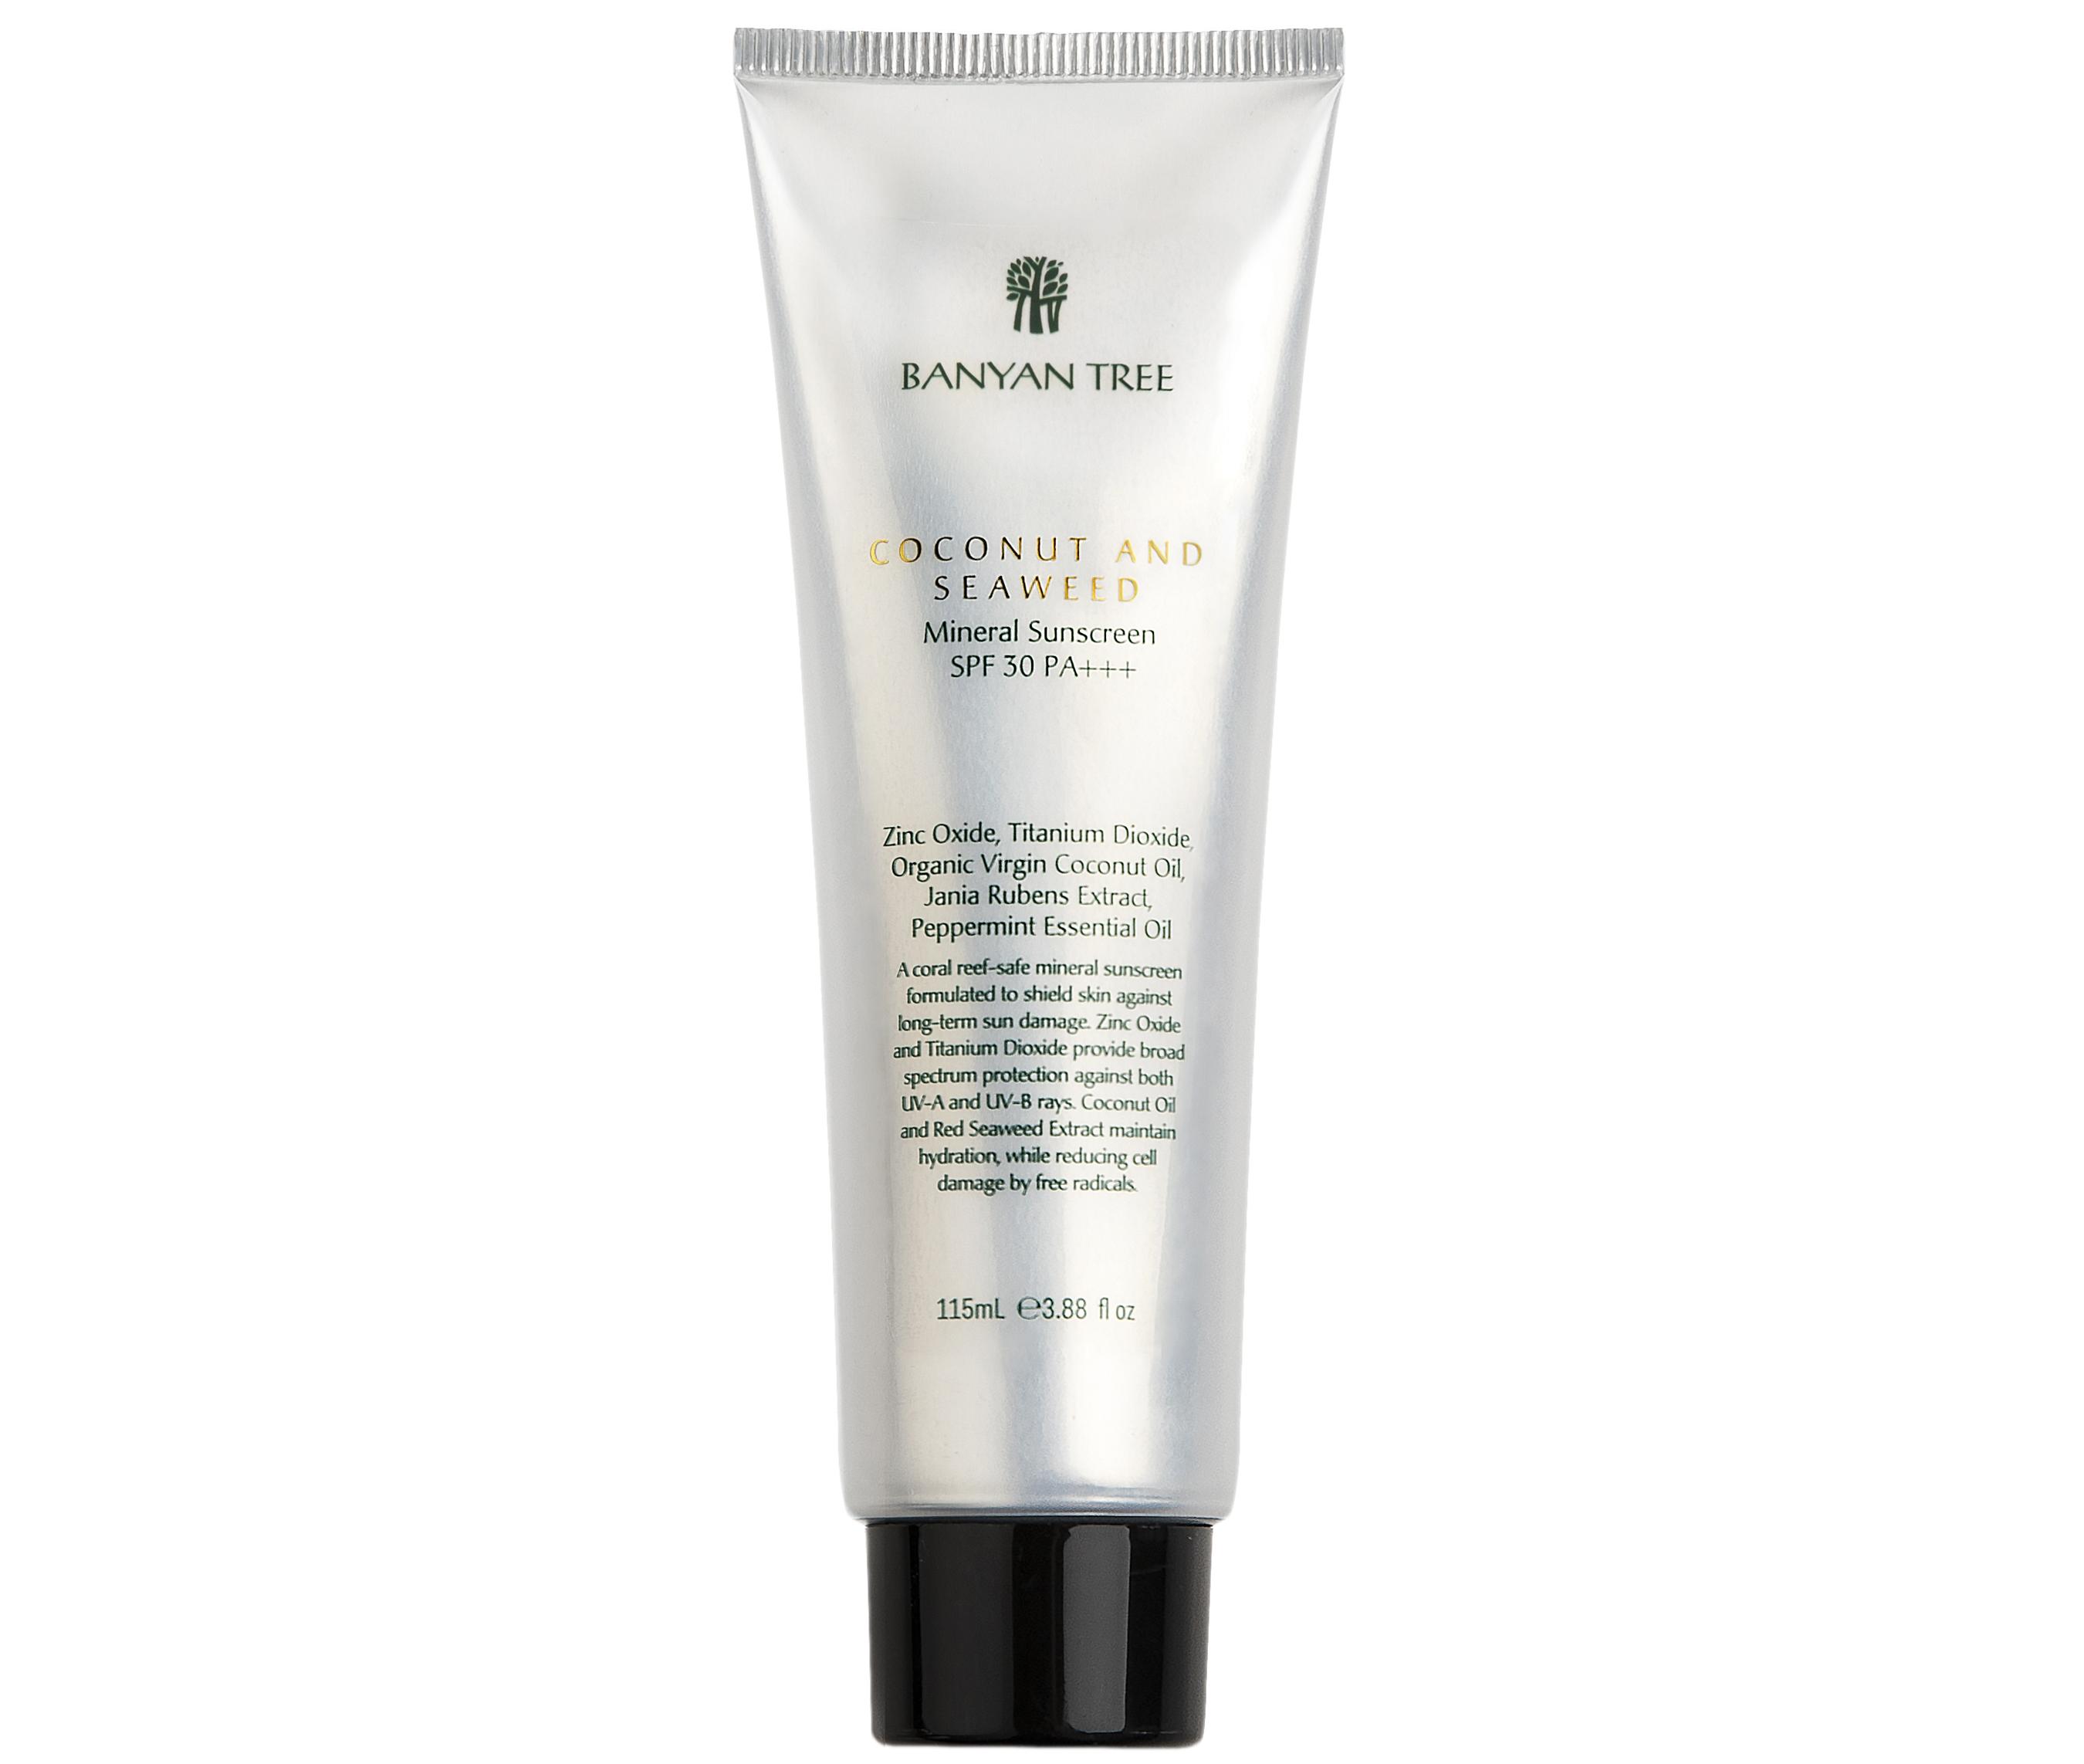 Banyan Tree Coconut & Seaweed Mineral Sunscreen SPF 30 PA+++, £32.90/AED146.91